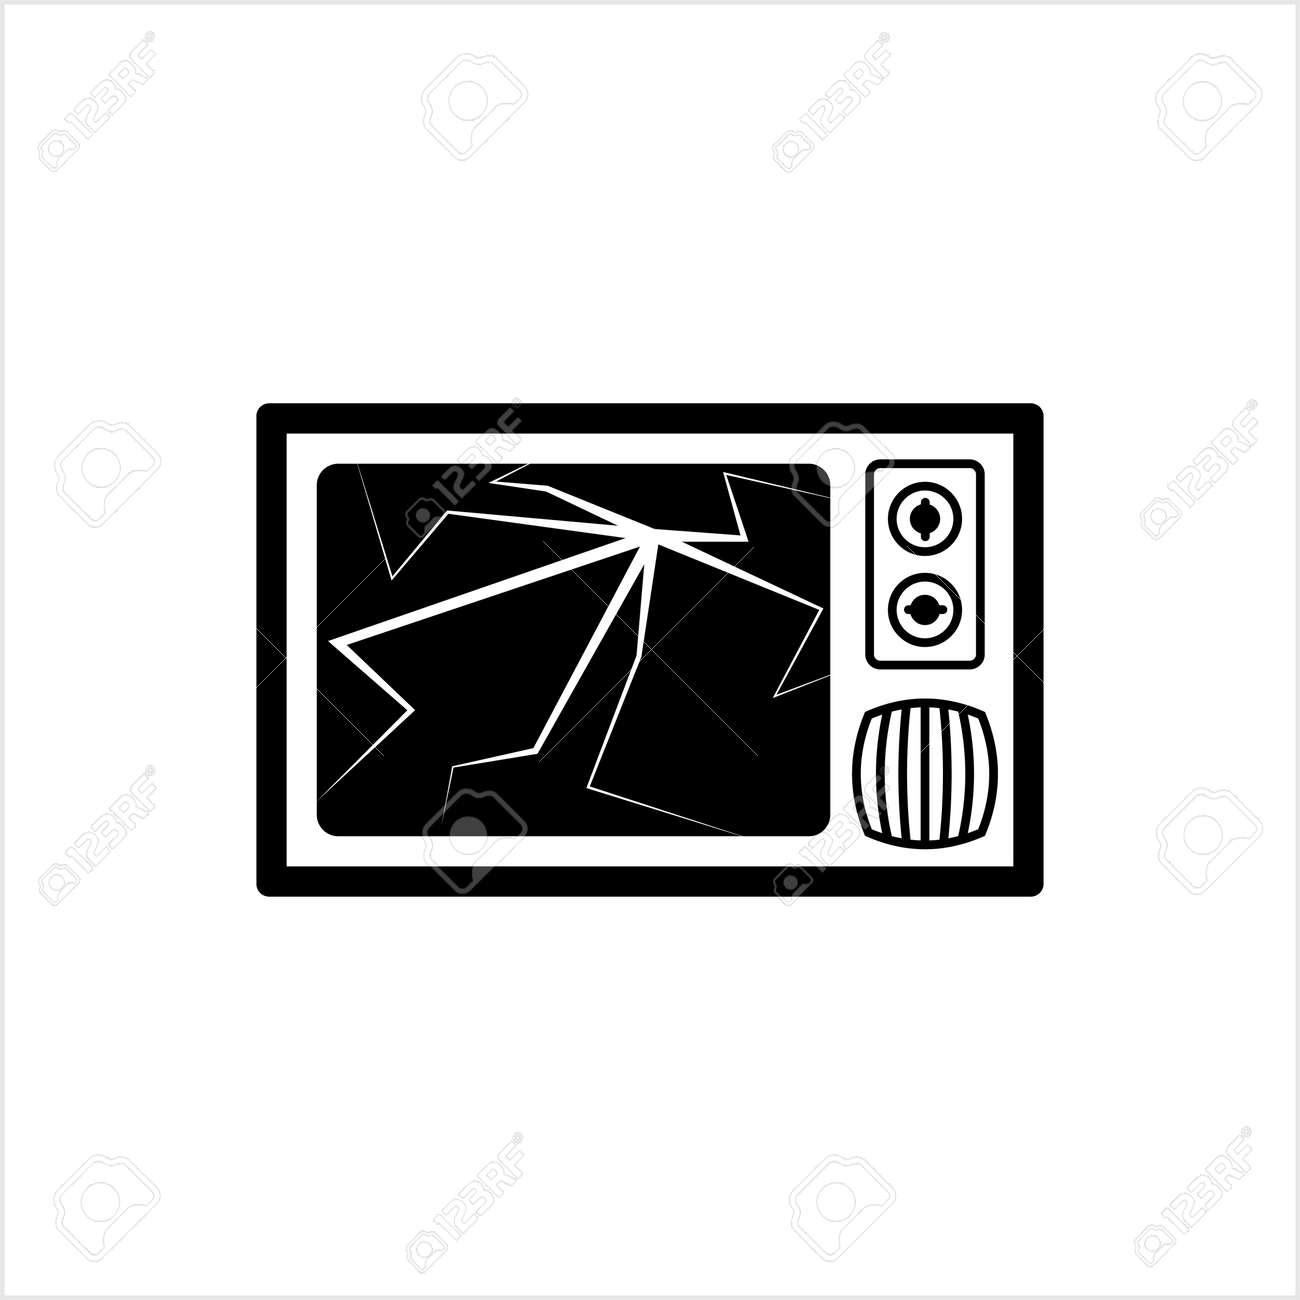 Cracked Tv Screen Icon Vector Art Illustration - 148095176